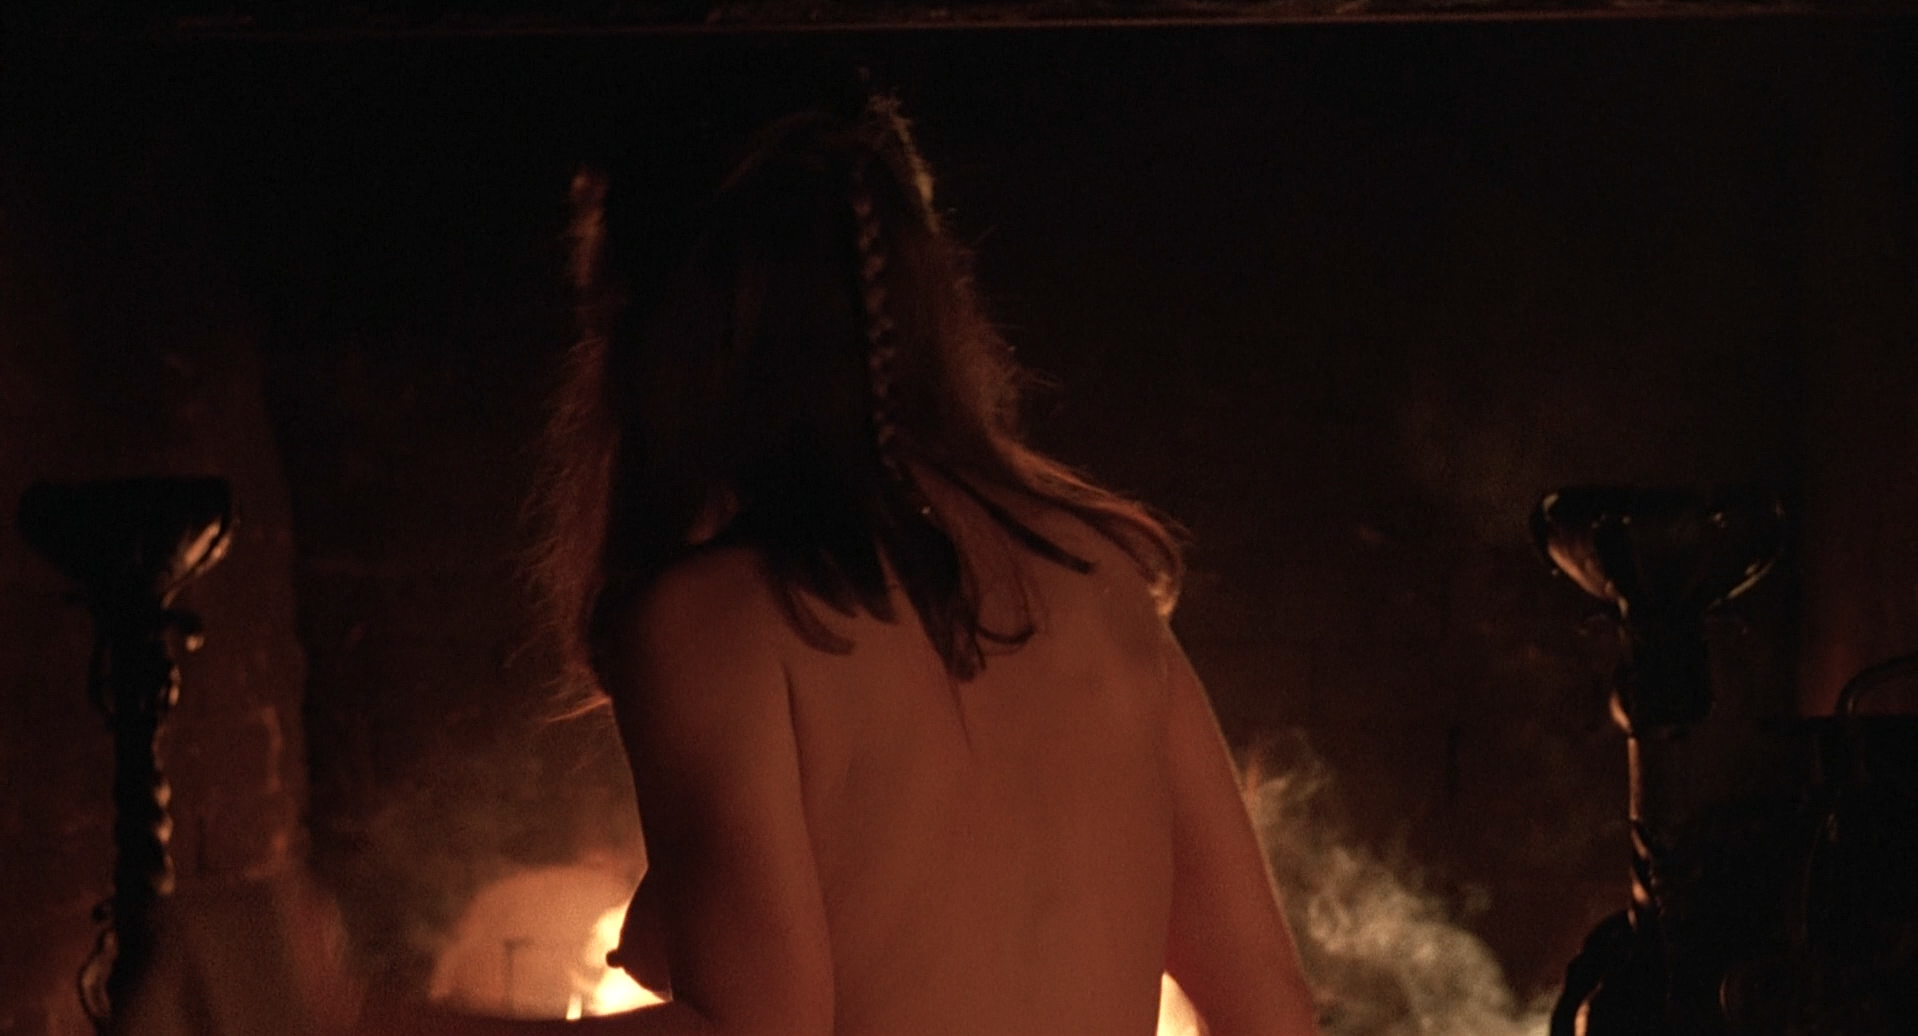 Theresa Russell nude butt sex and Debra Winger hot bikini - Black Widow 1987 1080p BluRay (10)